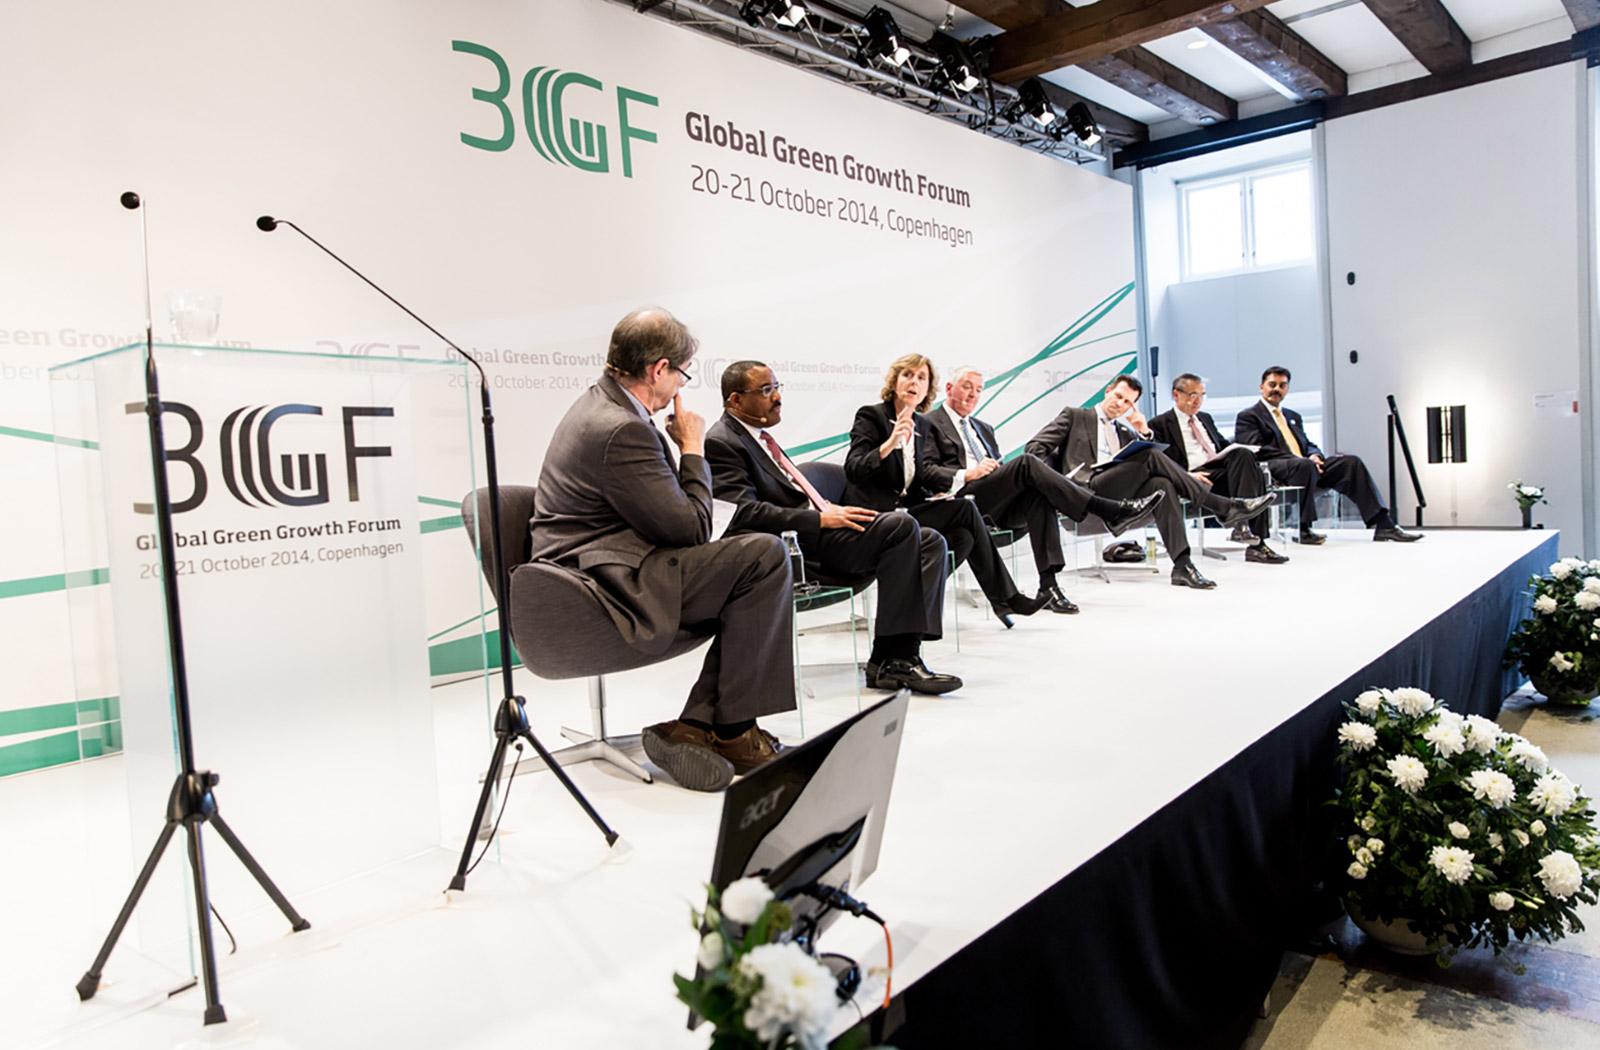 Global Green Growth Forum